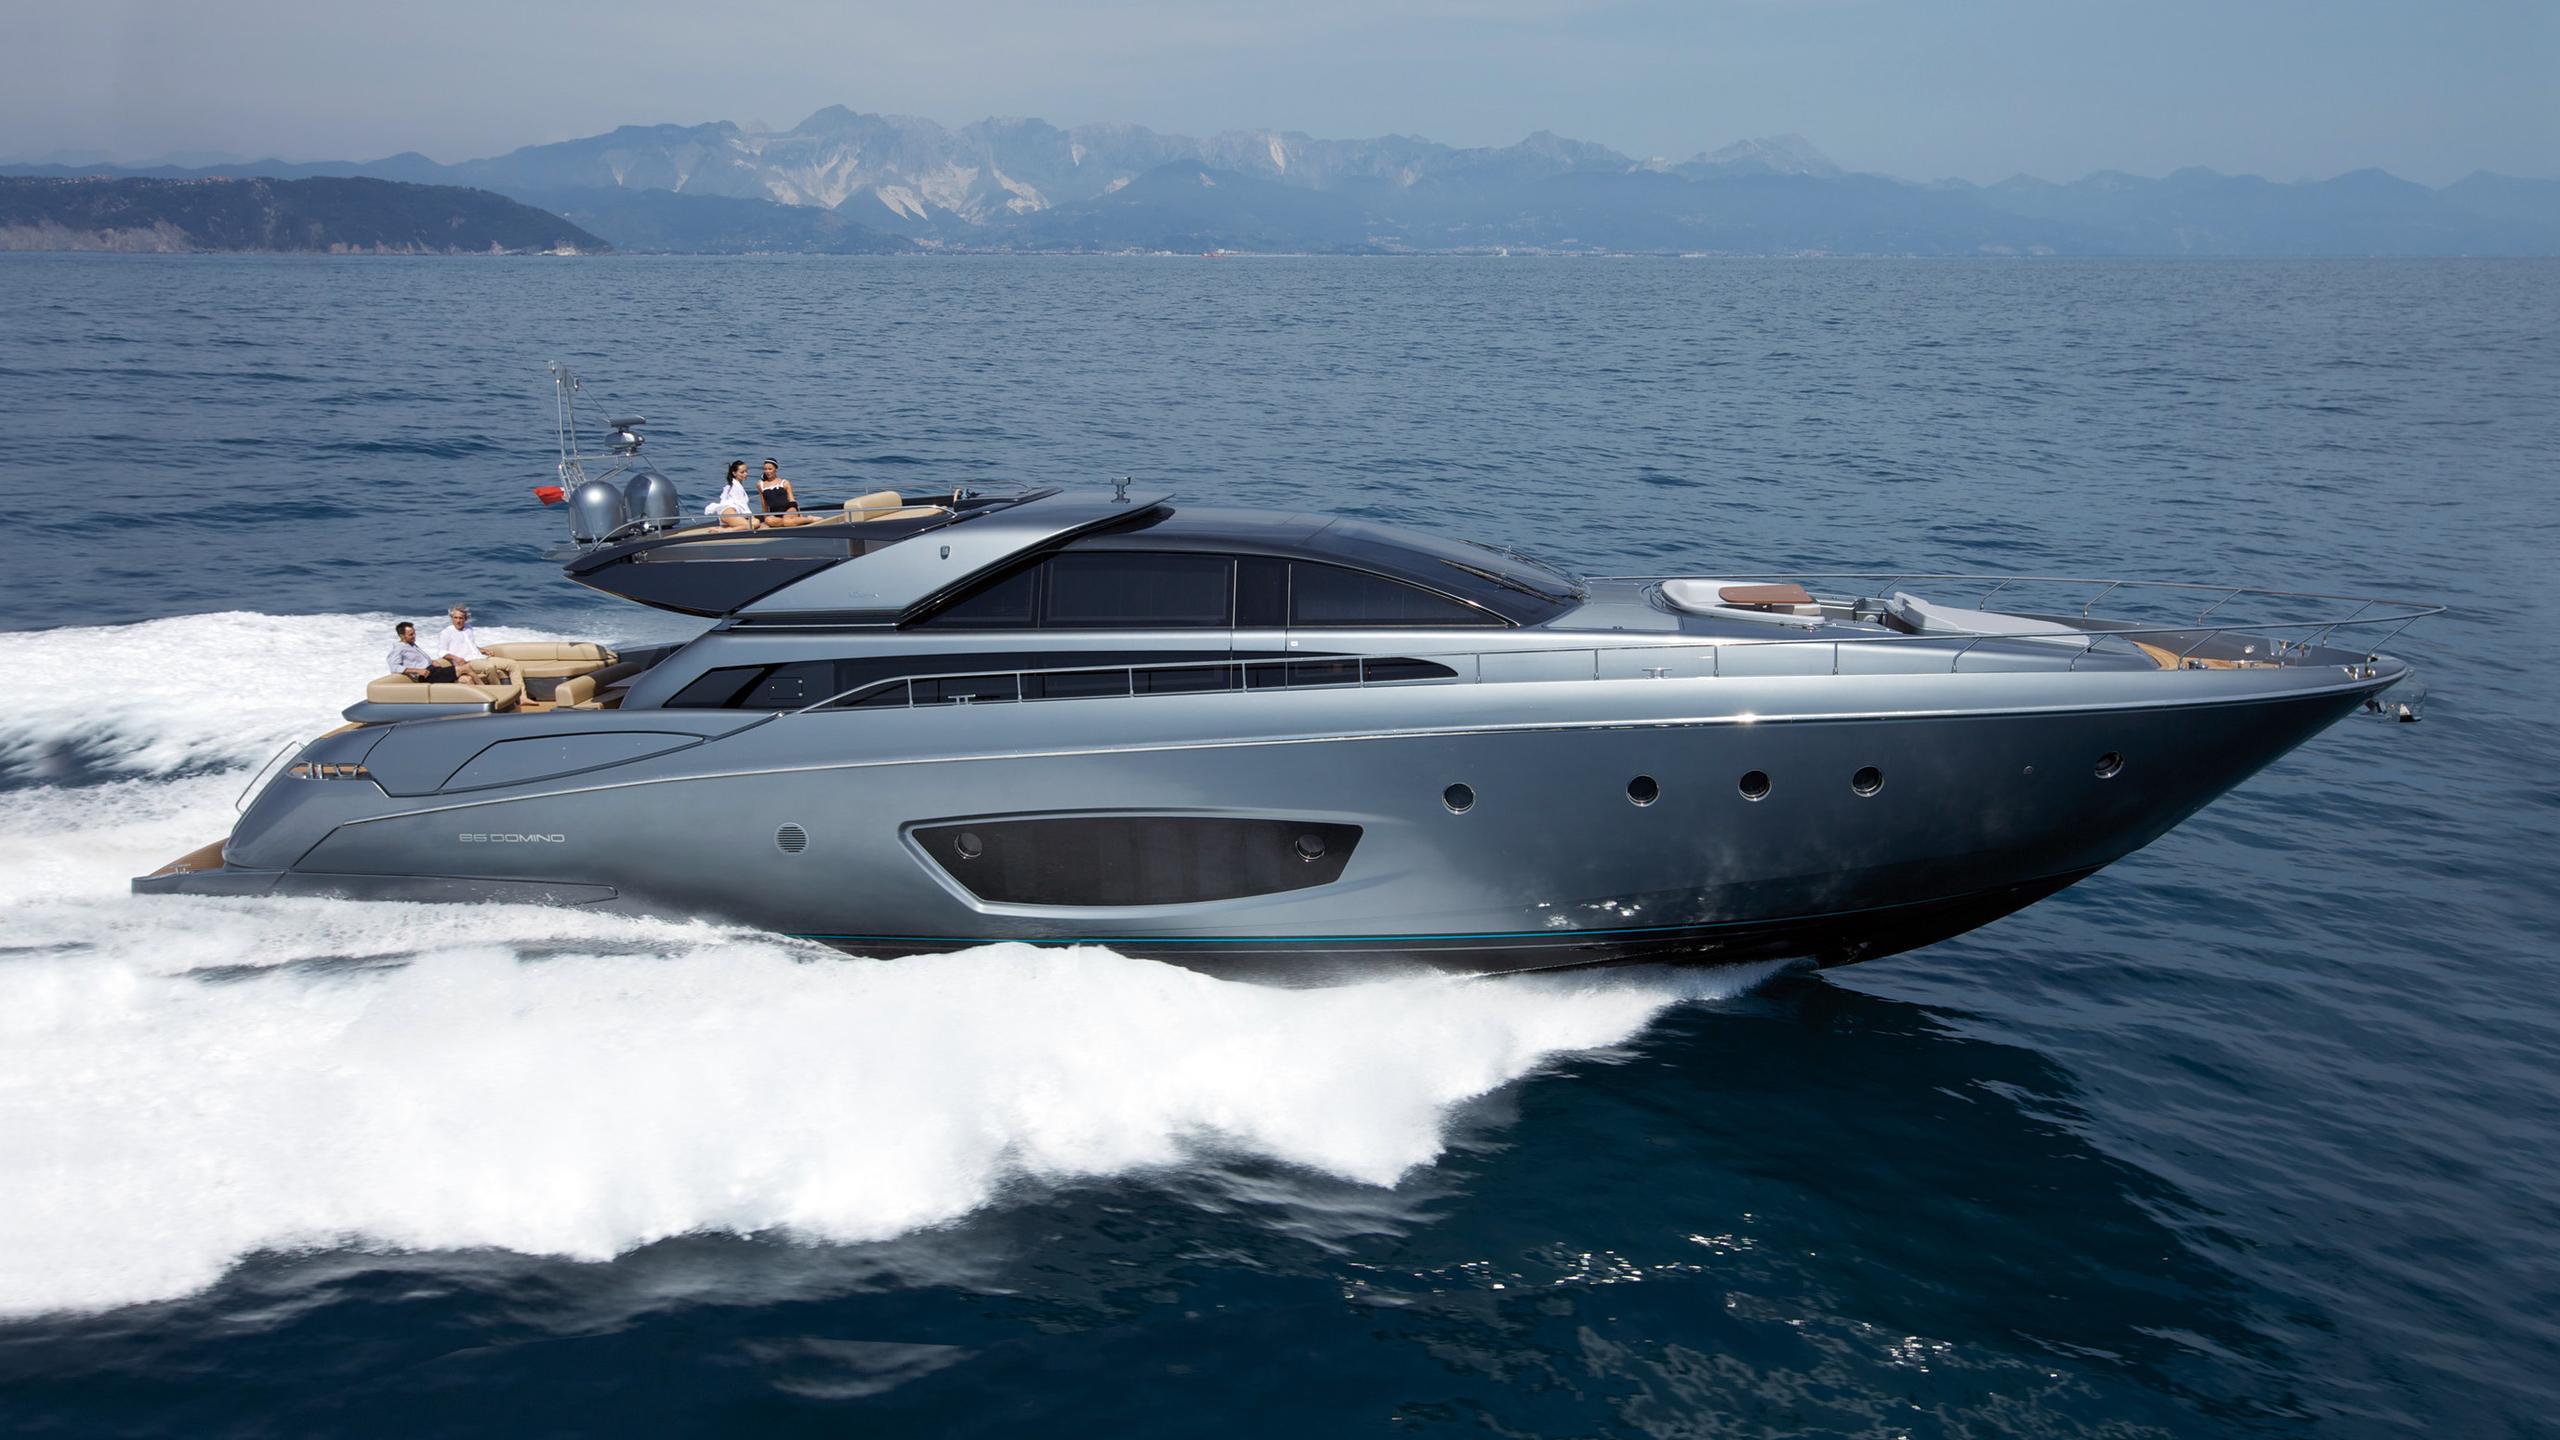 lalia-riva-86-domino-motor-yacht-2014-26m-profile-sistership